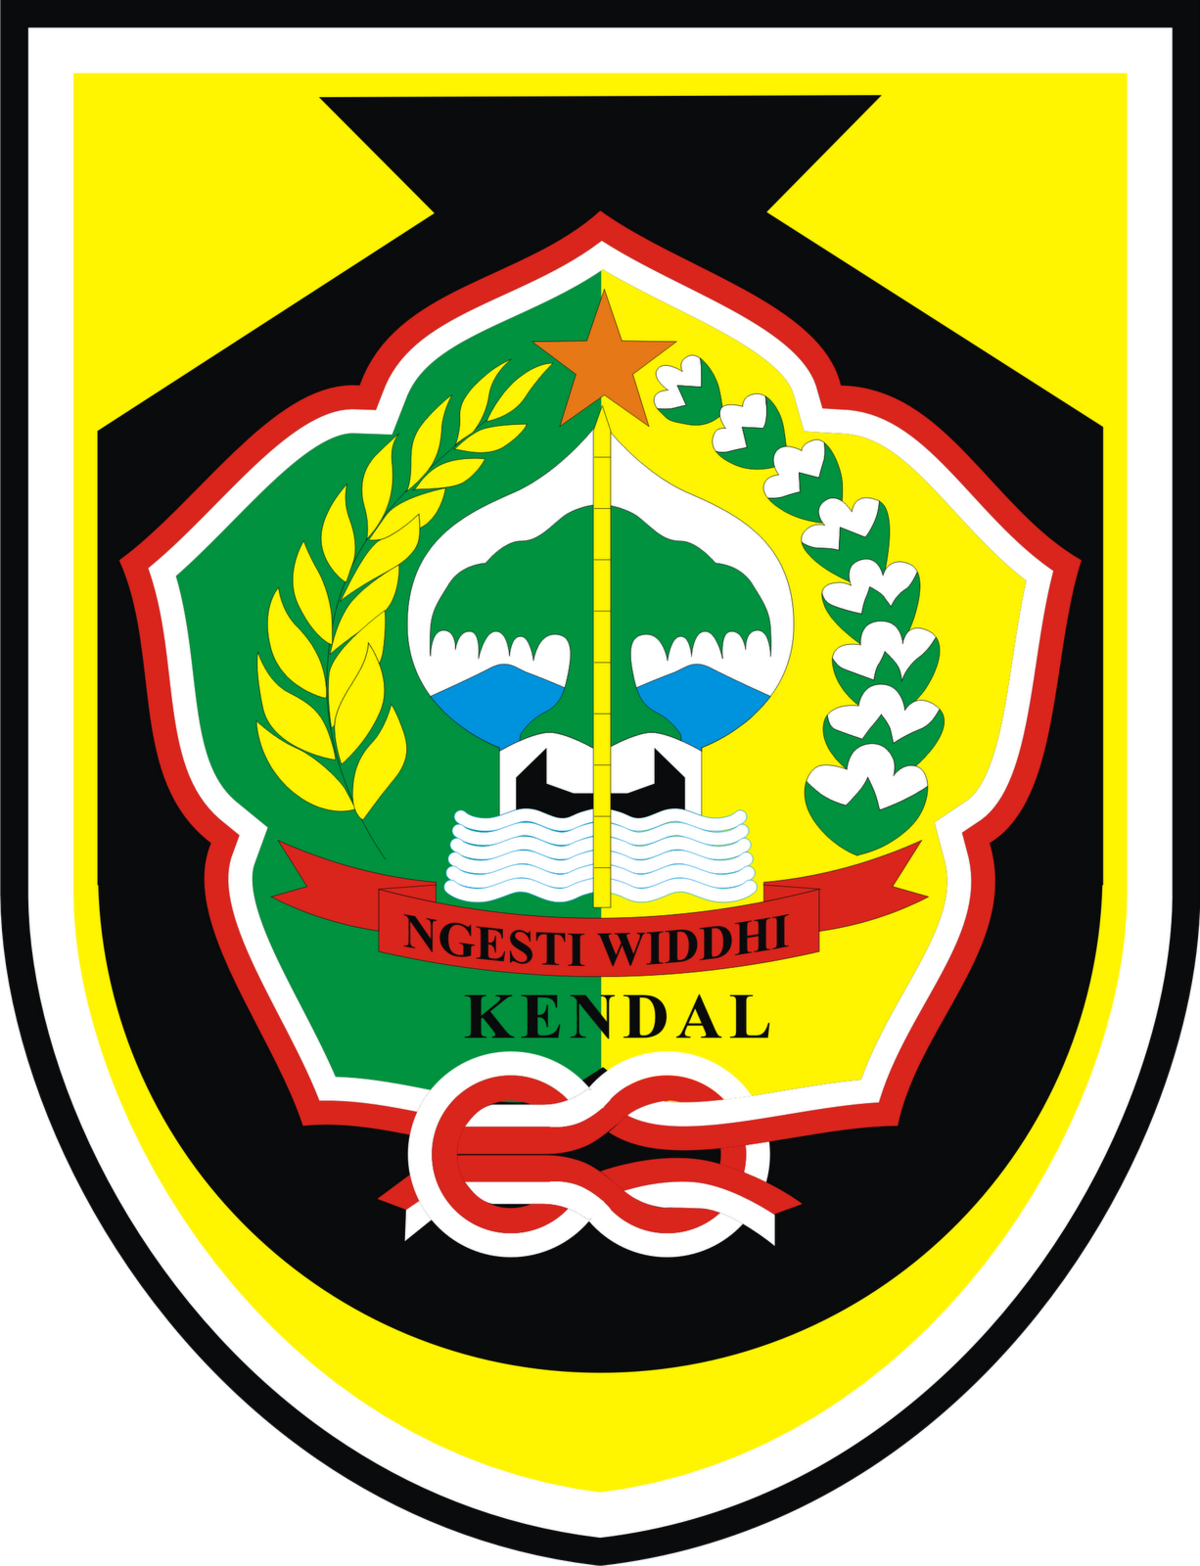 Berkas Logo Kabupaten Kendal Lama Png Wikipedia Bahasa Indonesia Ensiklopedia Bebas